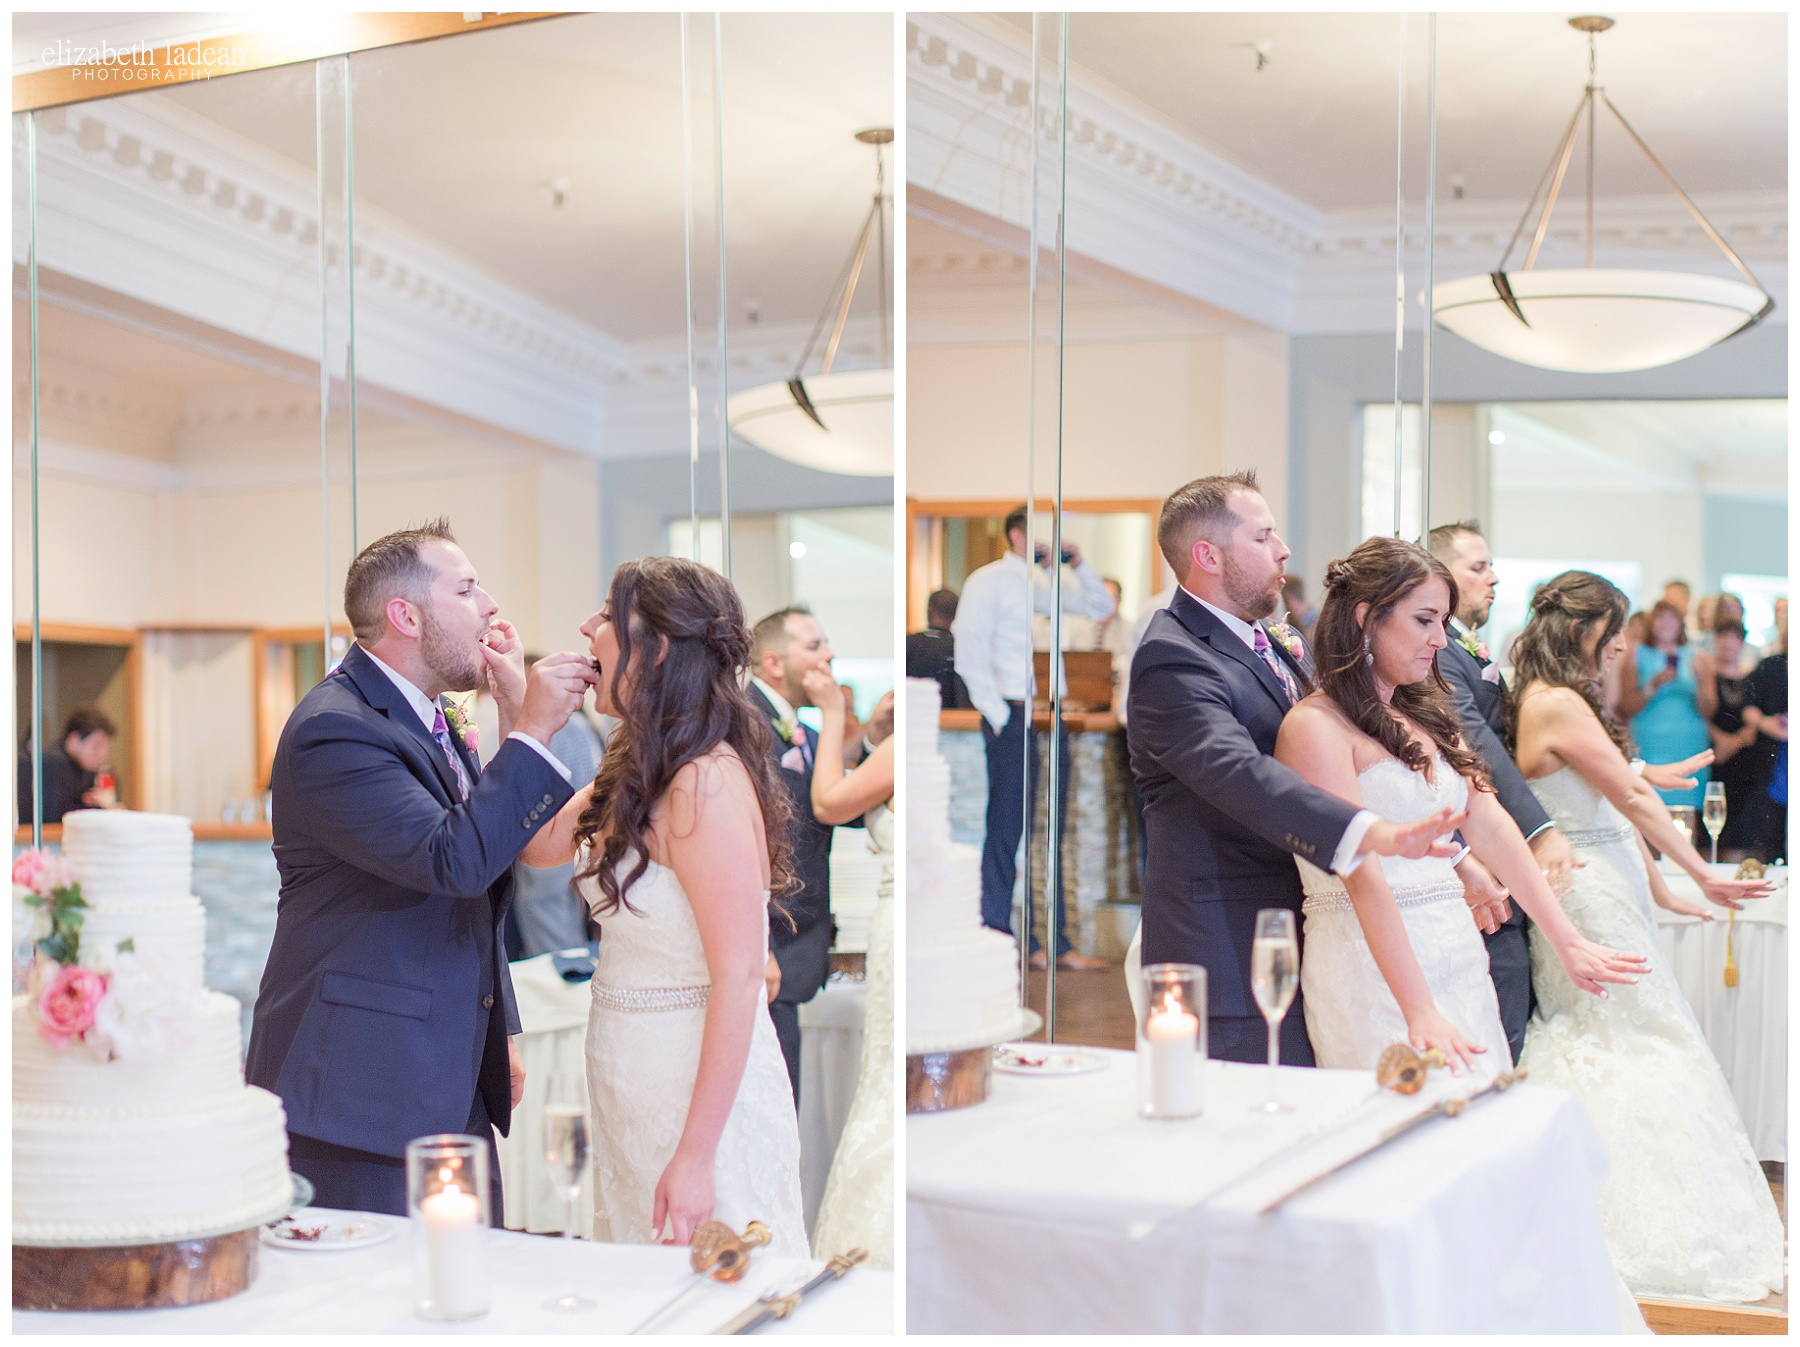 Hillcrest-Country-Club-Kansas-City-Wedding-Photography-E+J-0520-Elizabeth-Ladean-Photography-photo_0863.jpg